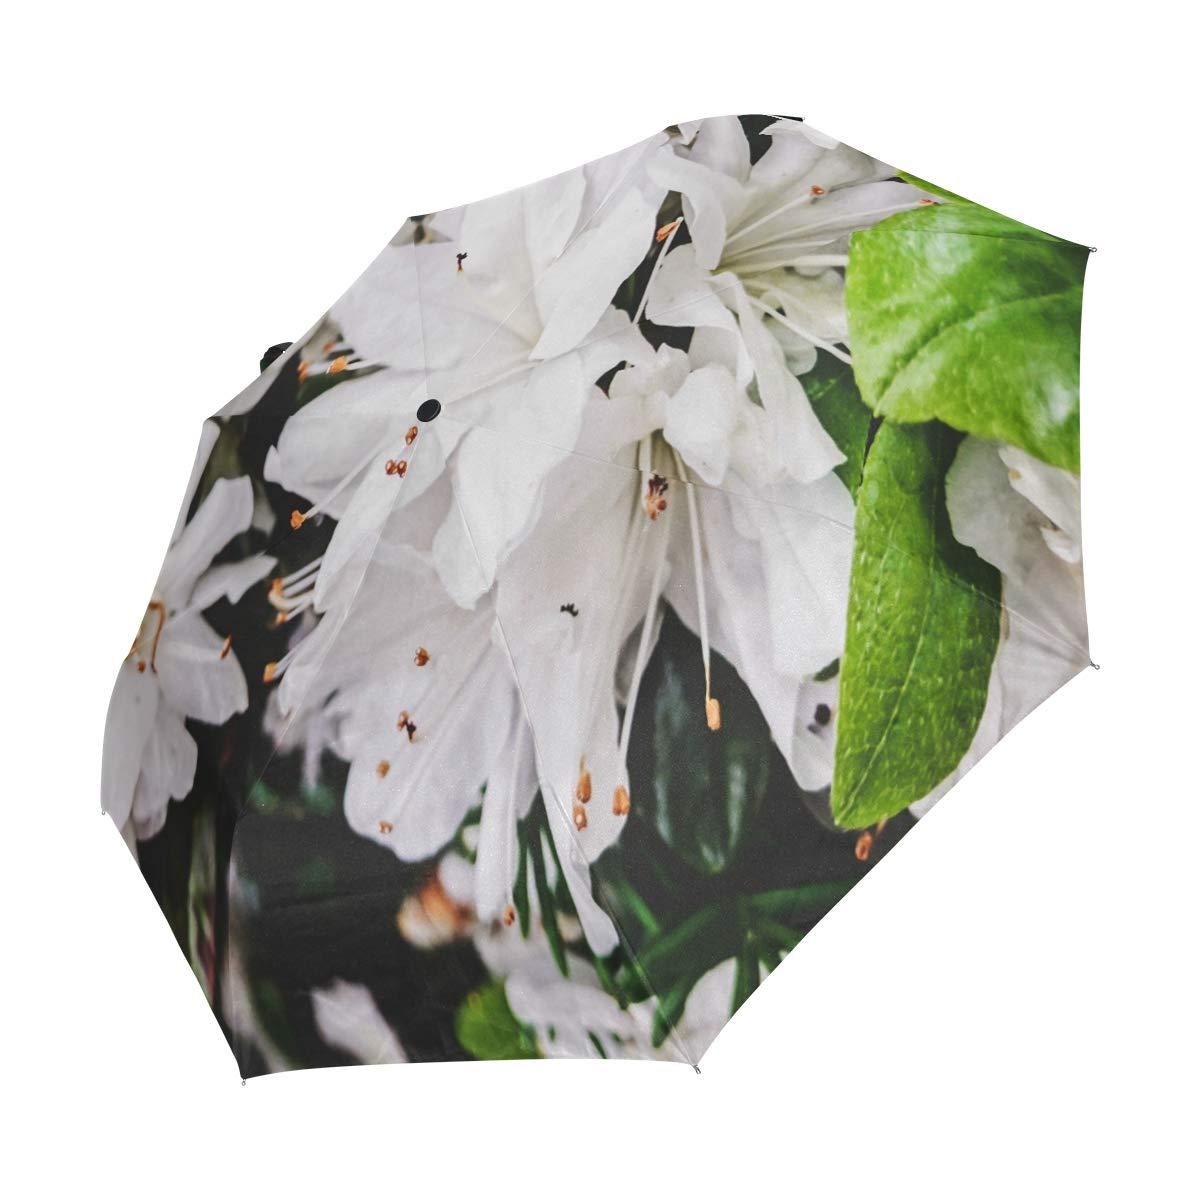 c9412e512a46 Amazon.com: Umbrella White Flowers Golf Travel Sun Rain Windproof ...